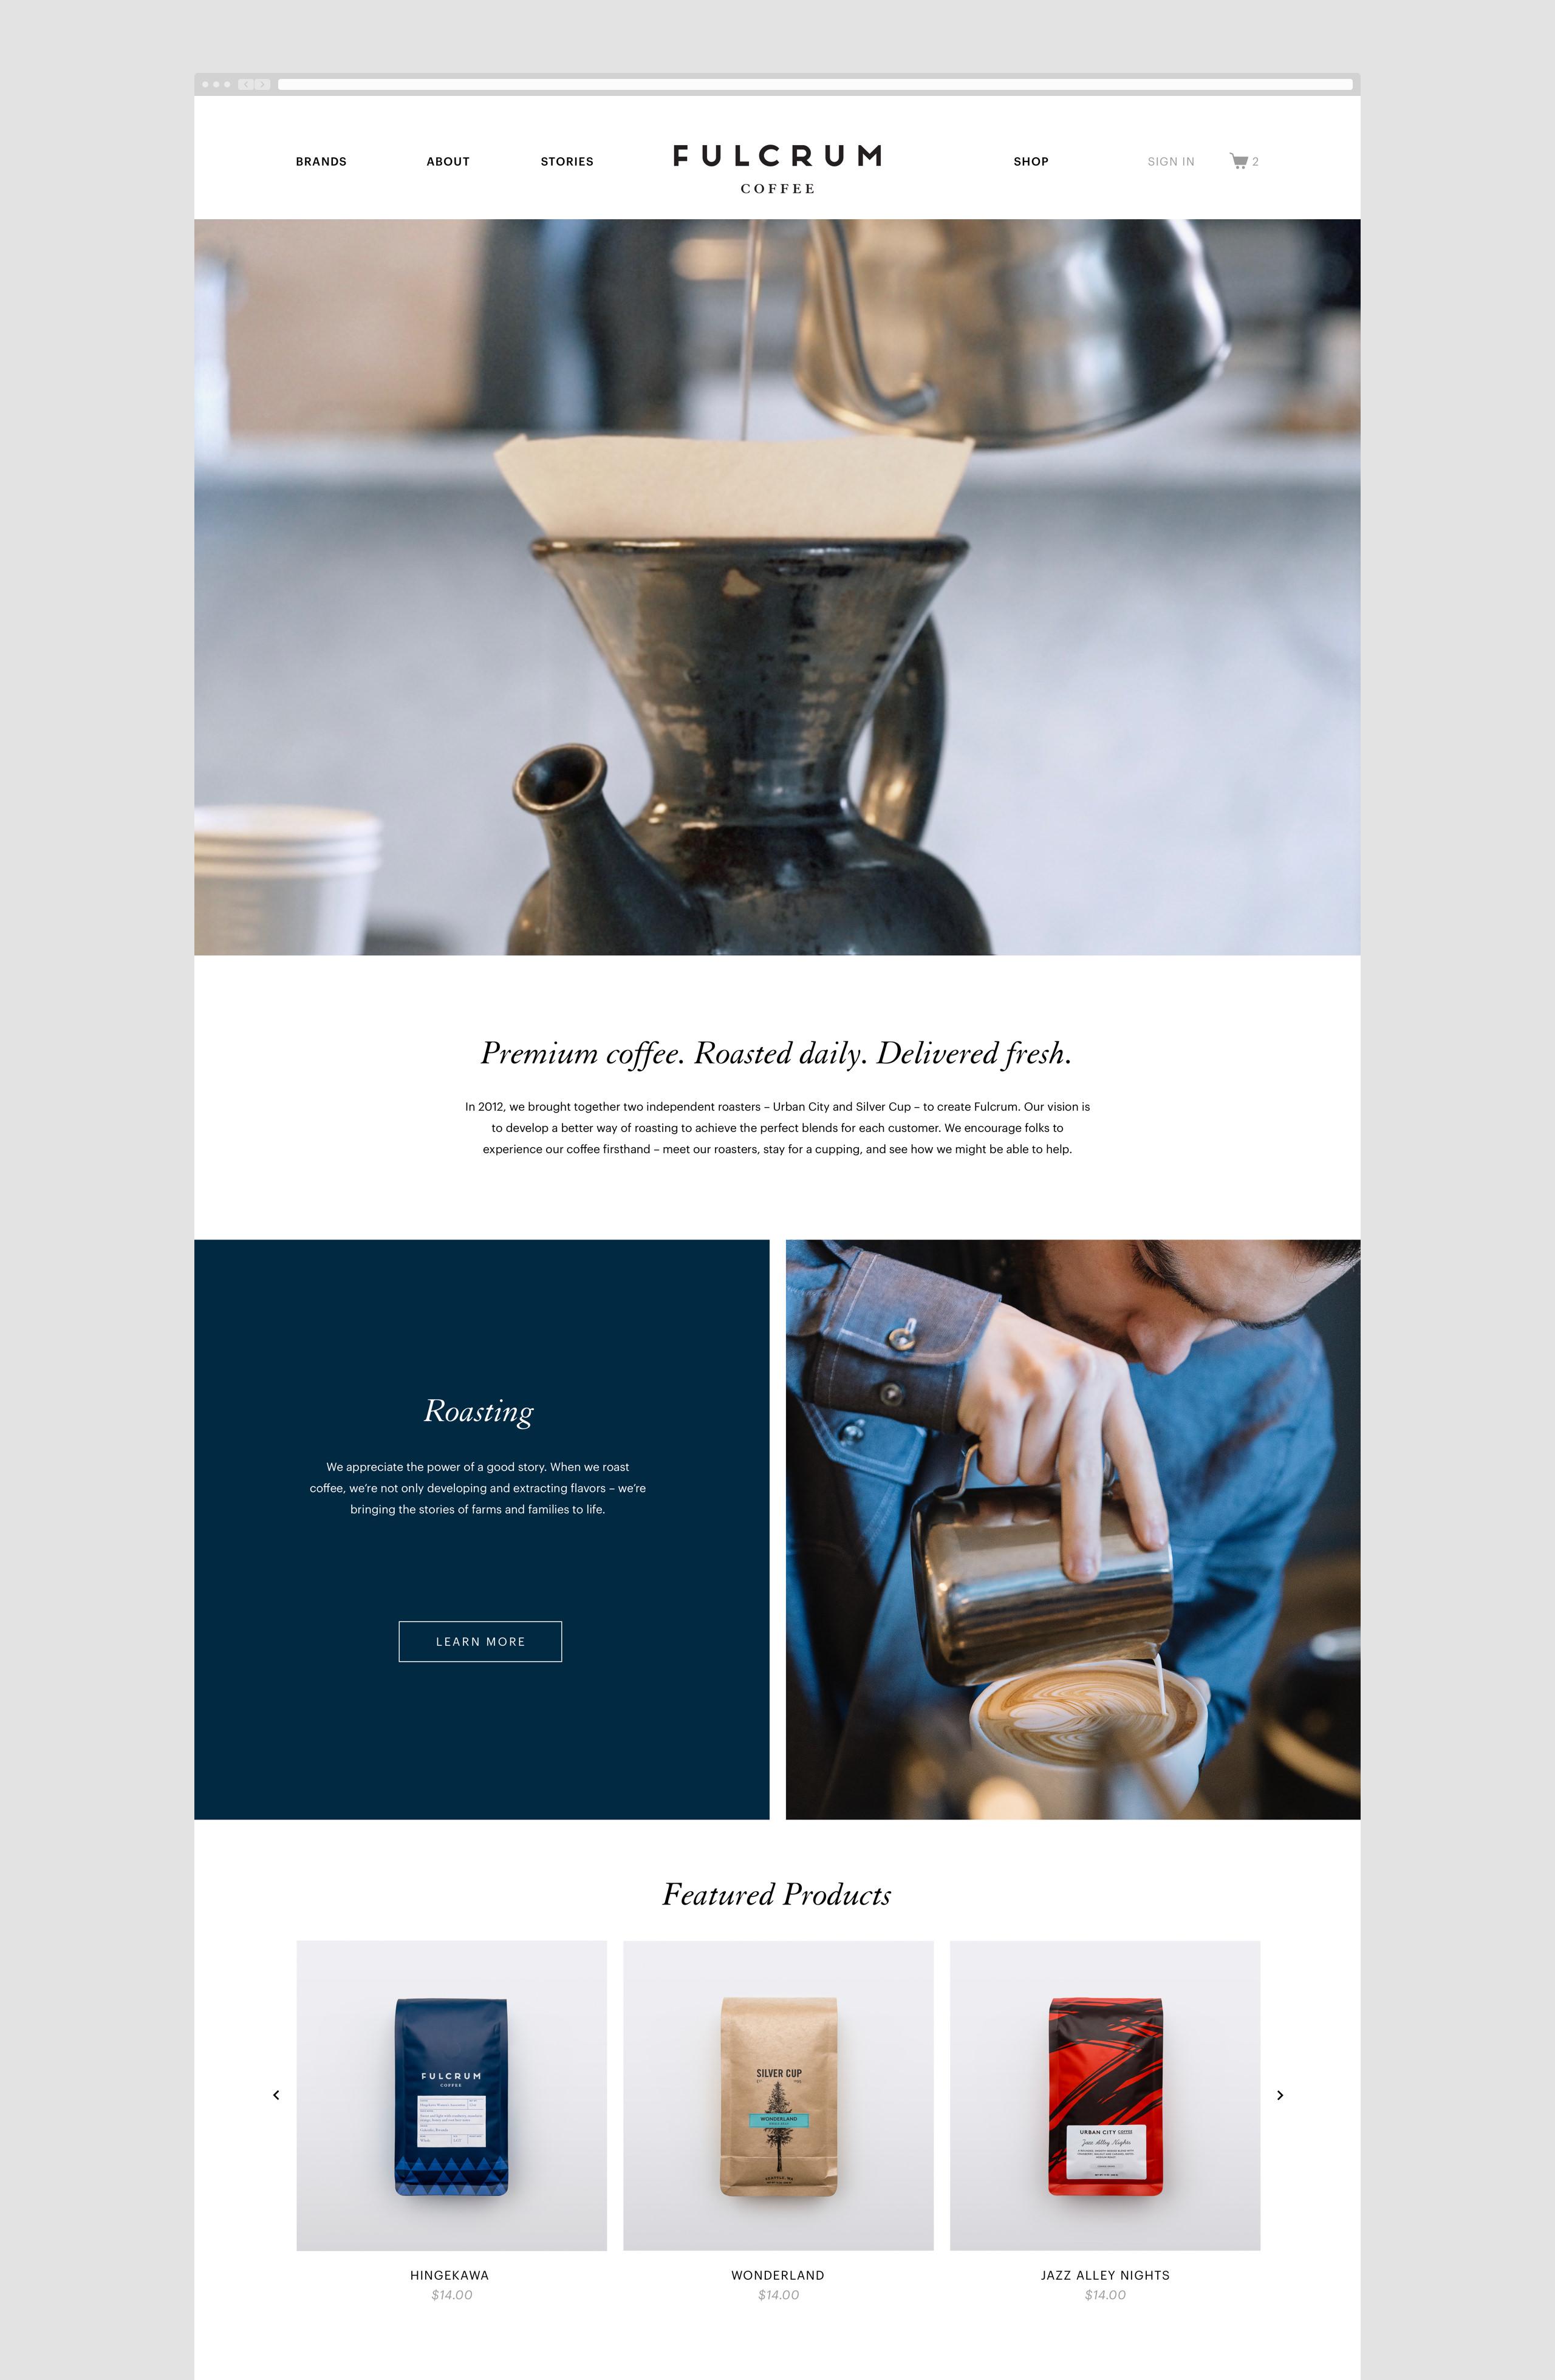 tolleson-case-study-fulcrum-coffee-interactive-02